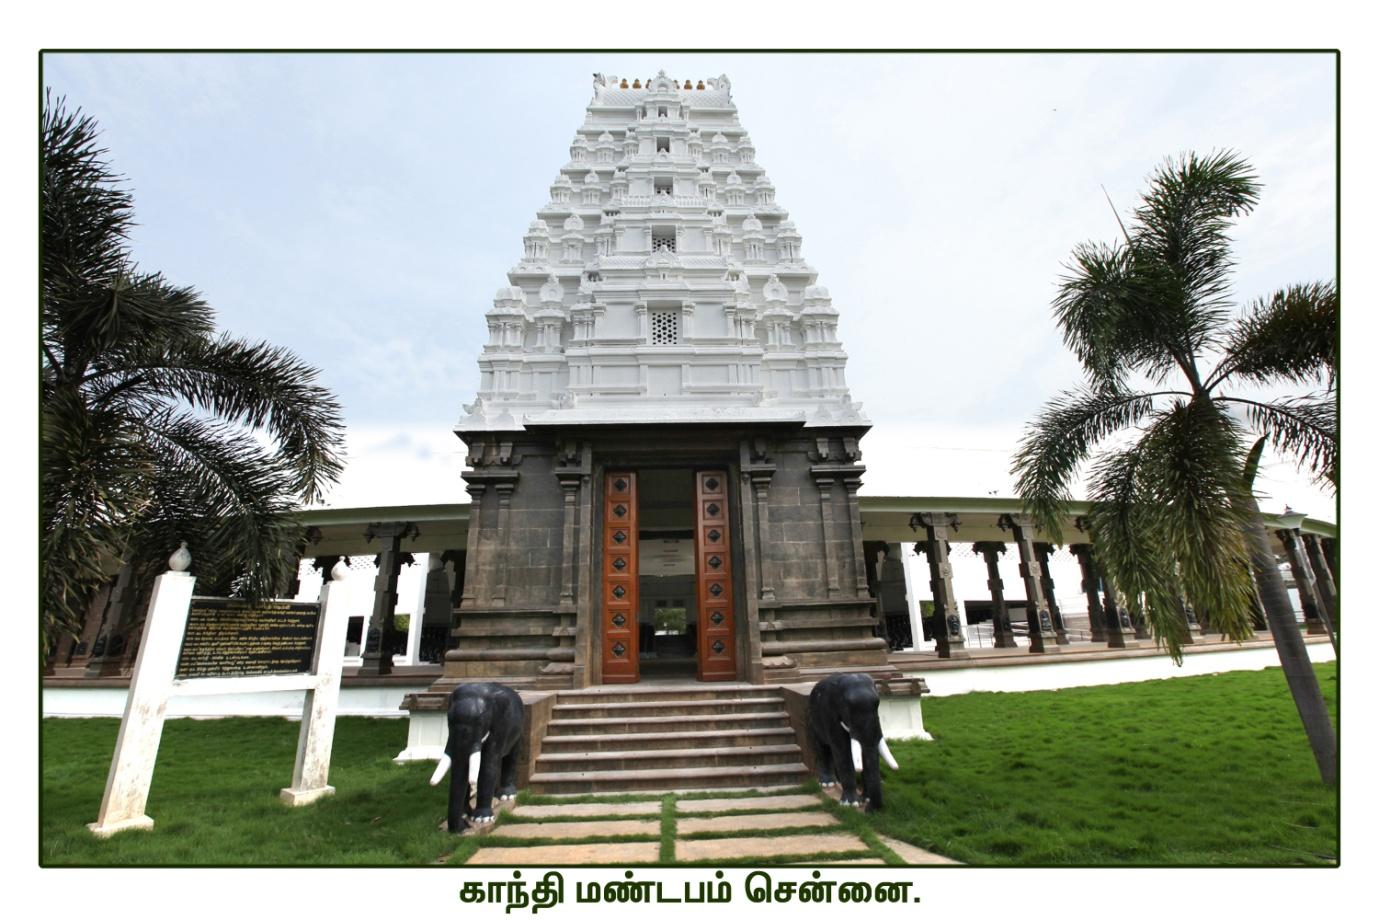 chennai gandhi mandapam க்கான பட முடிவு